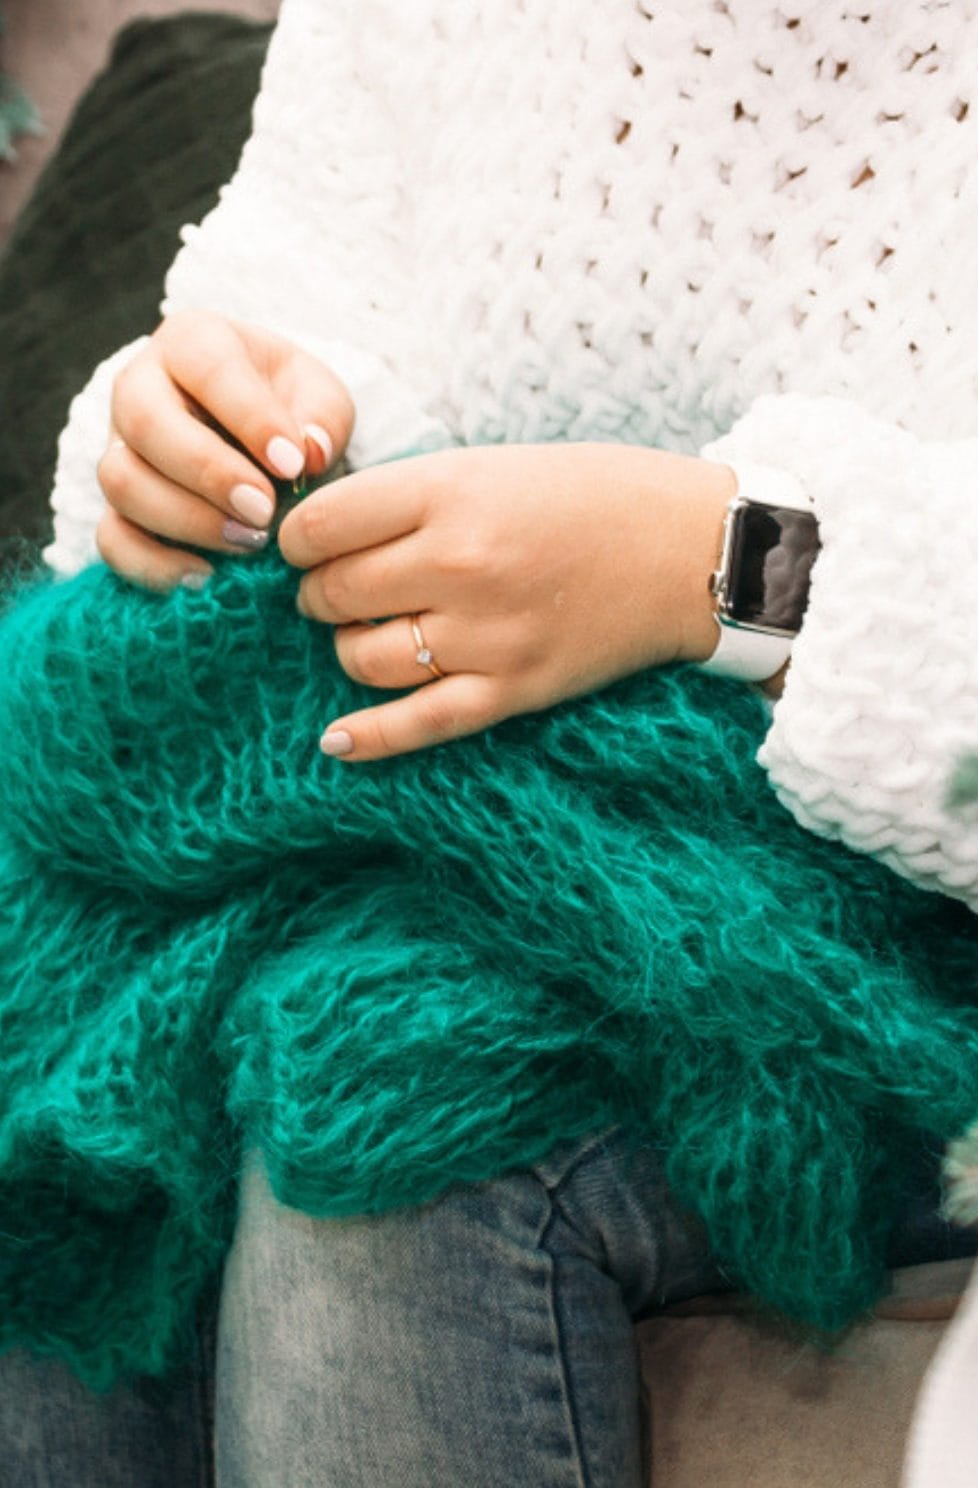 How To Knit – Stockinette Stitch